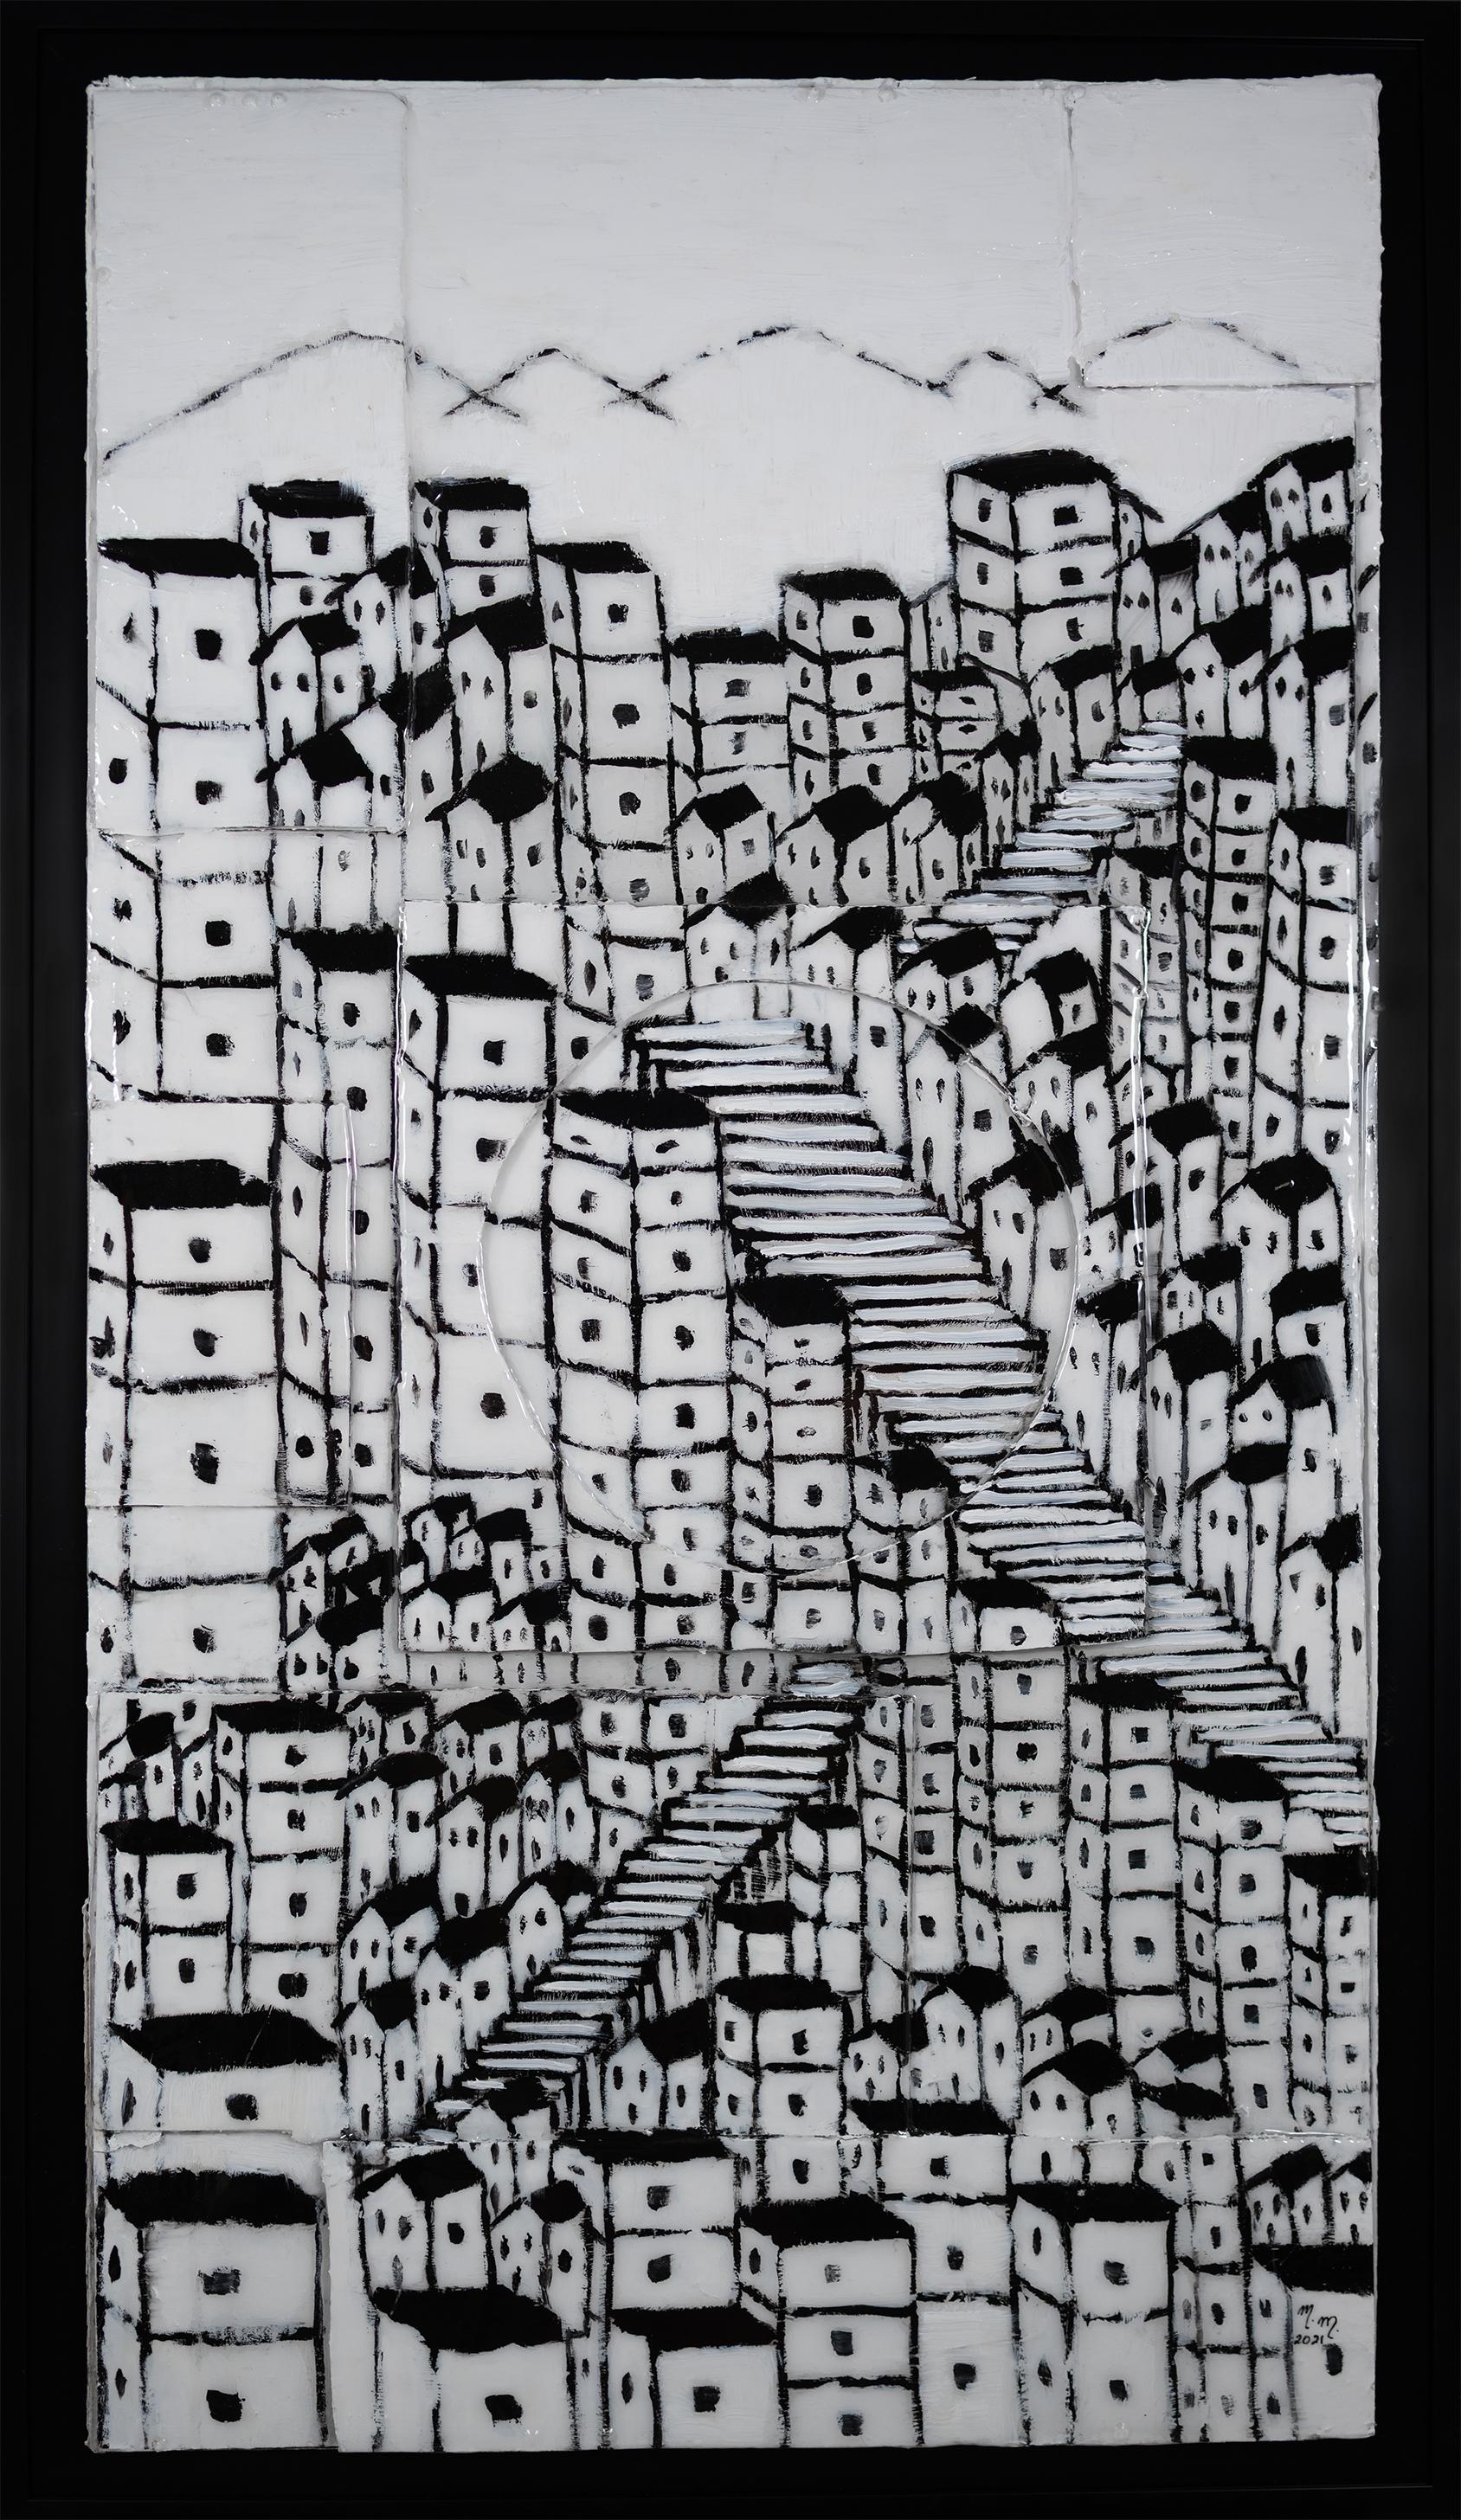 "Favela Branca - 43"" x 23"" - Mix Media on Cardboard"